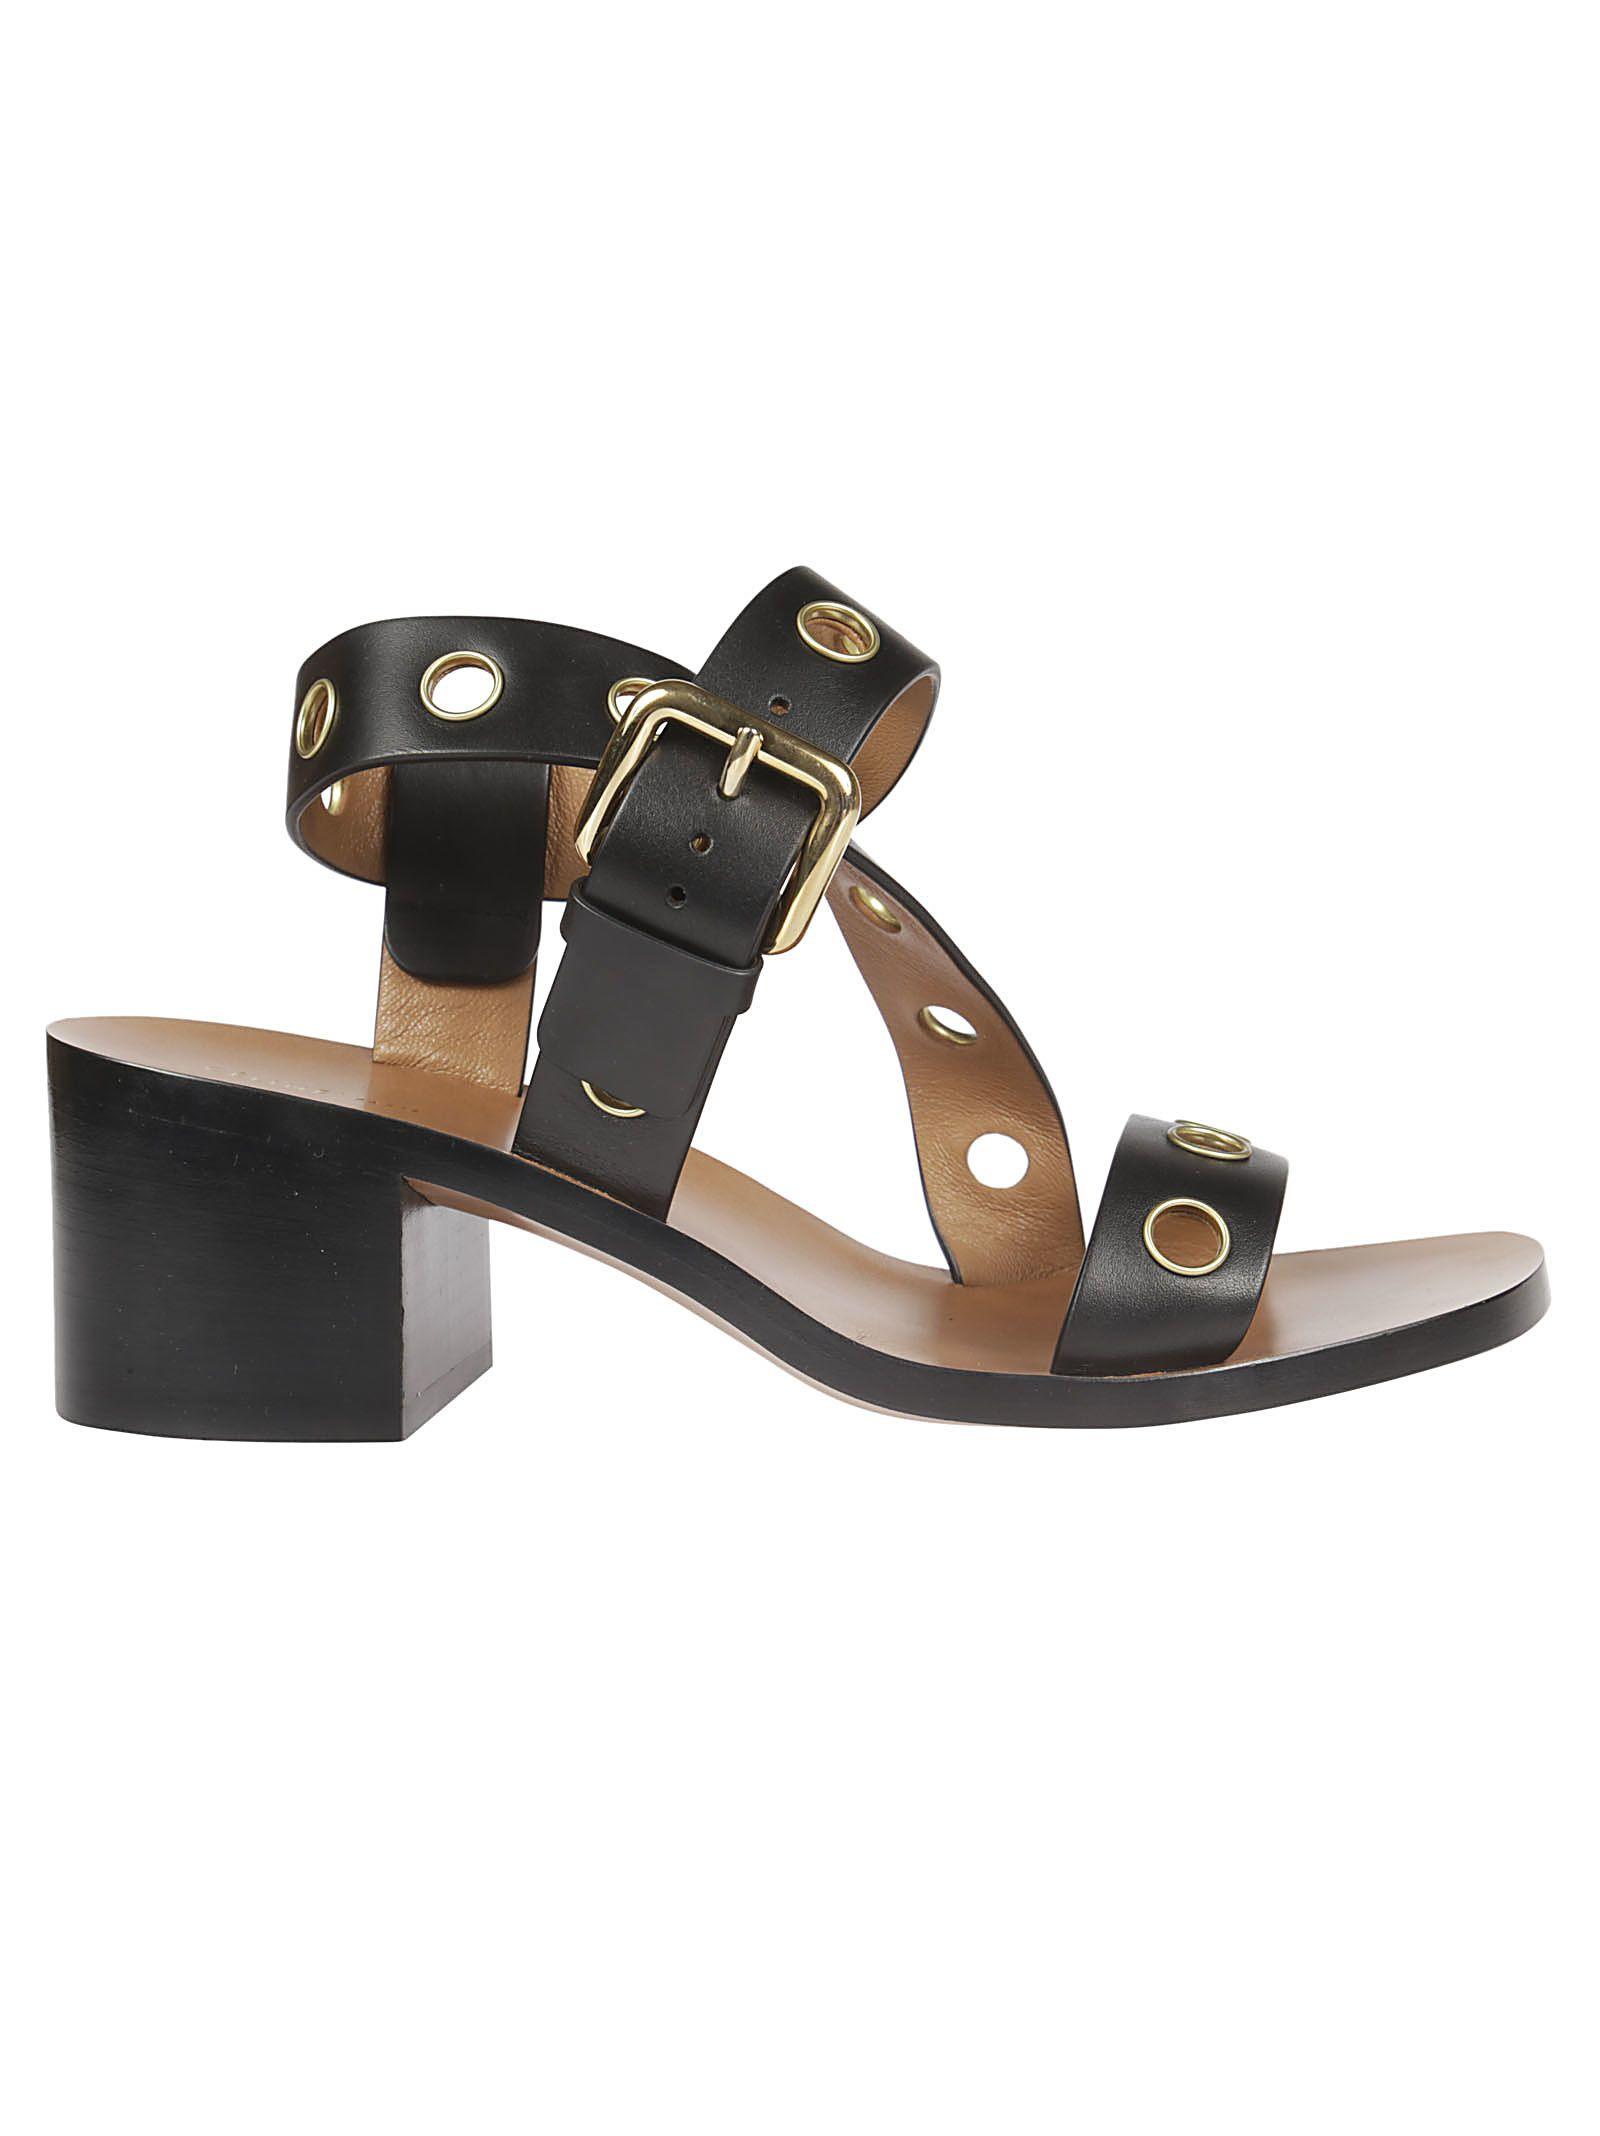 Celine Hole Sandals